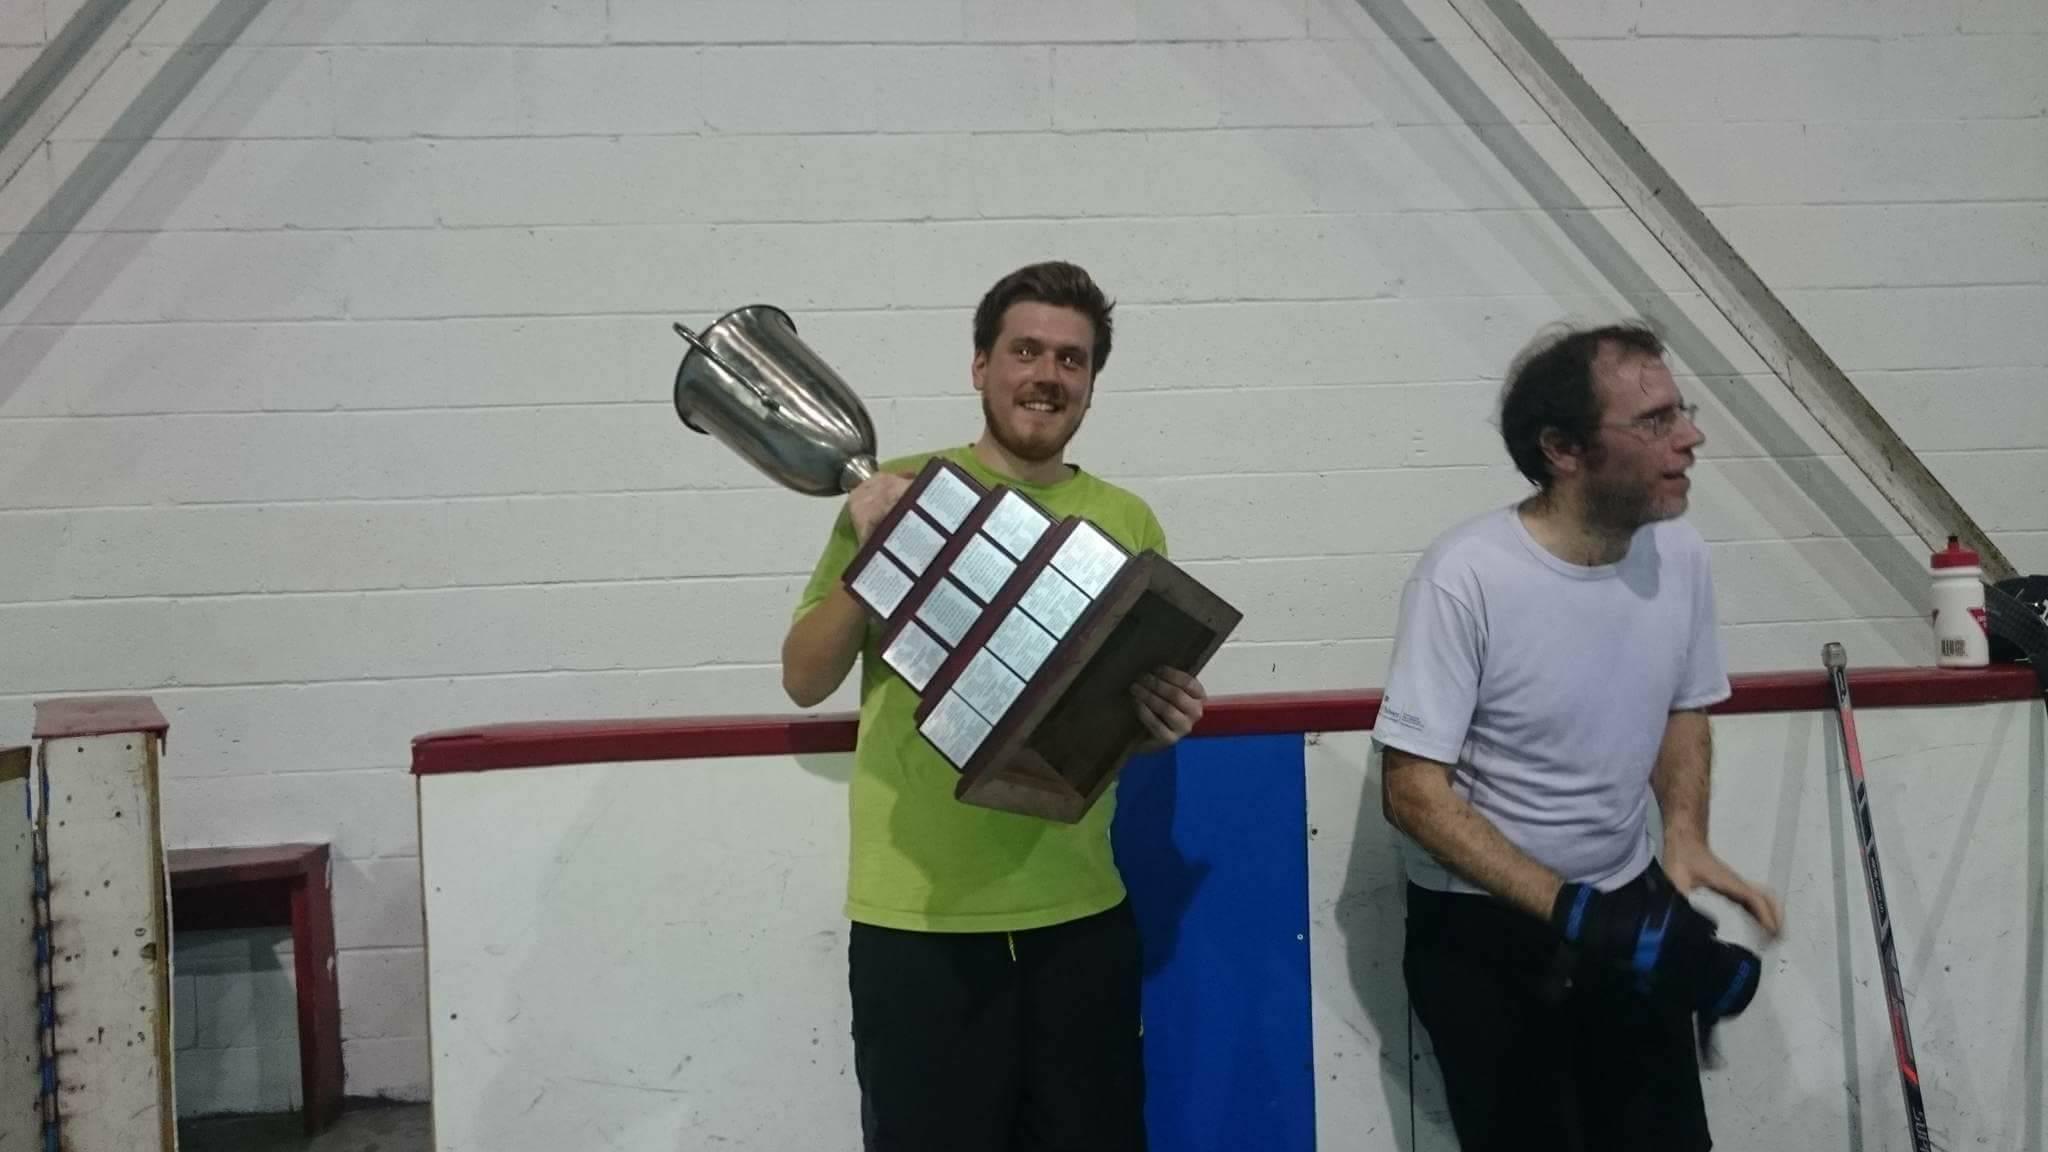 Champions_hockey_cosom_hockey_balle_printemps_2017 (3)